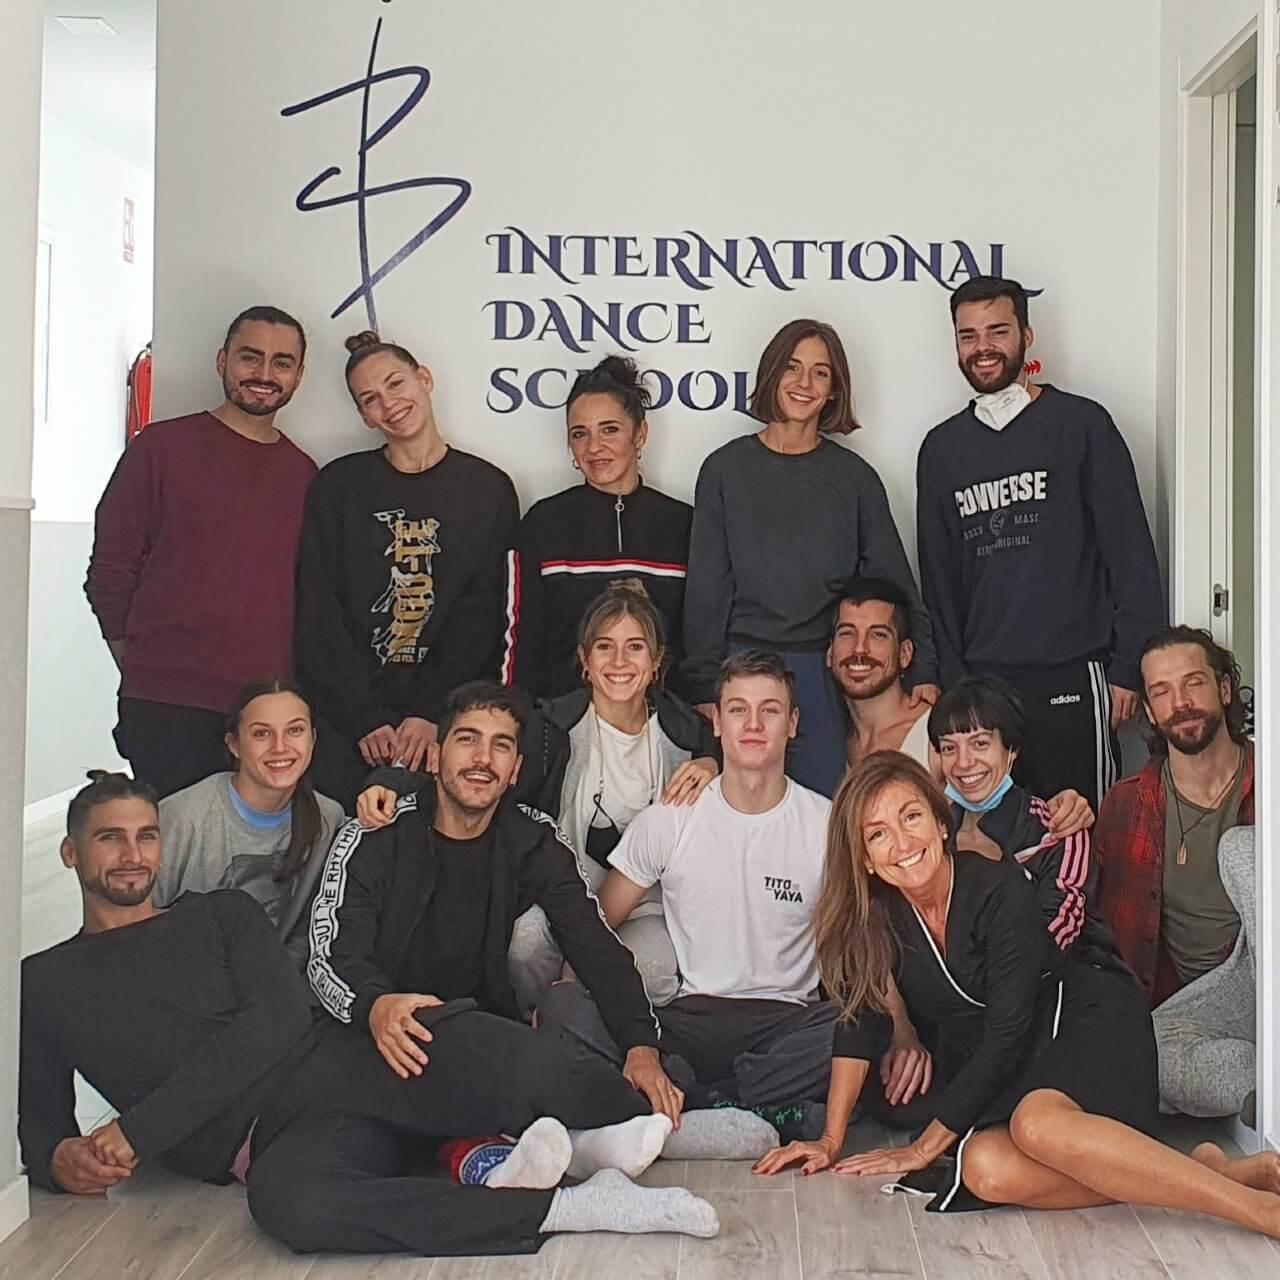 titoyaya dansa compañia residente ids escuela danza 2020 2021 destacada